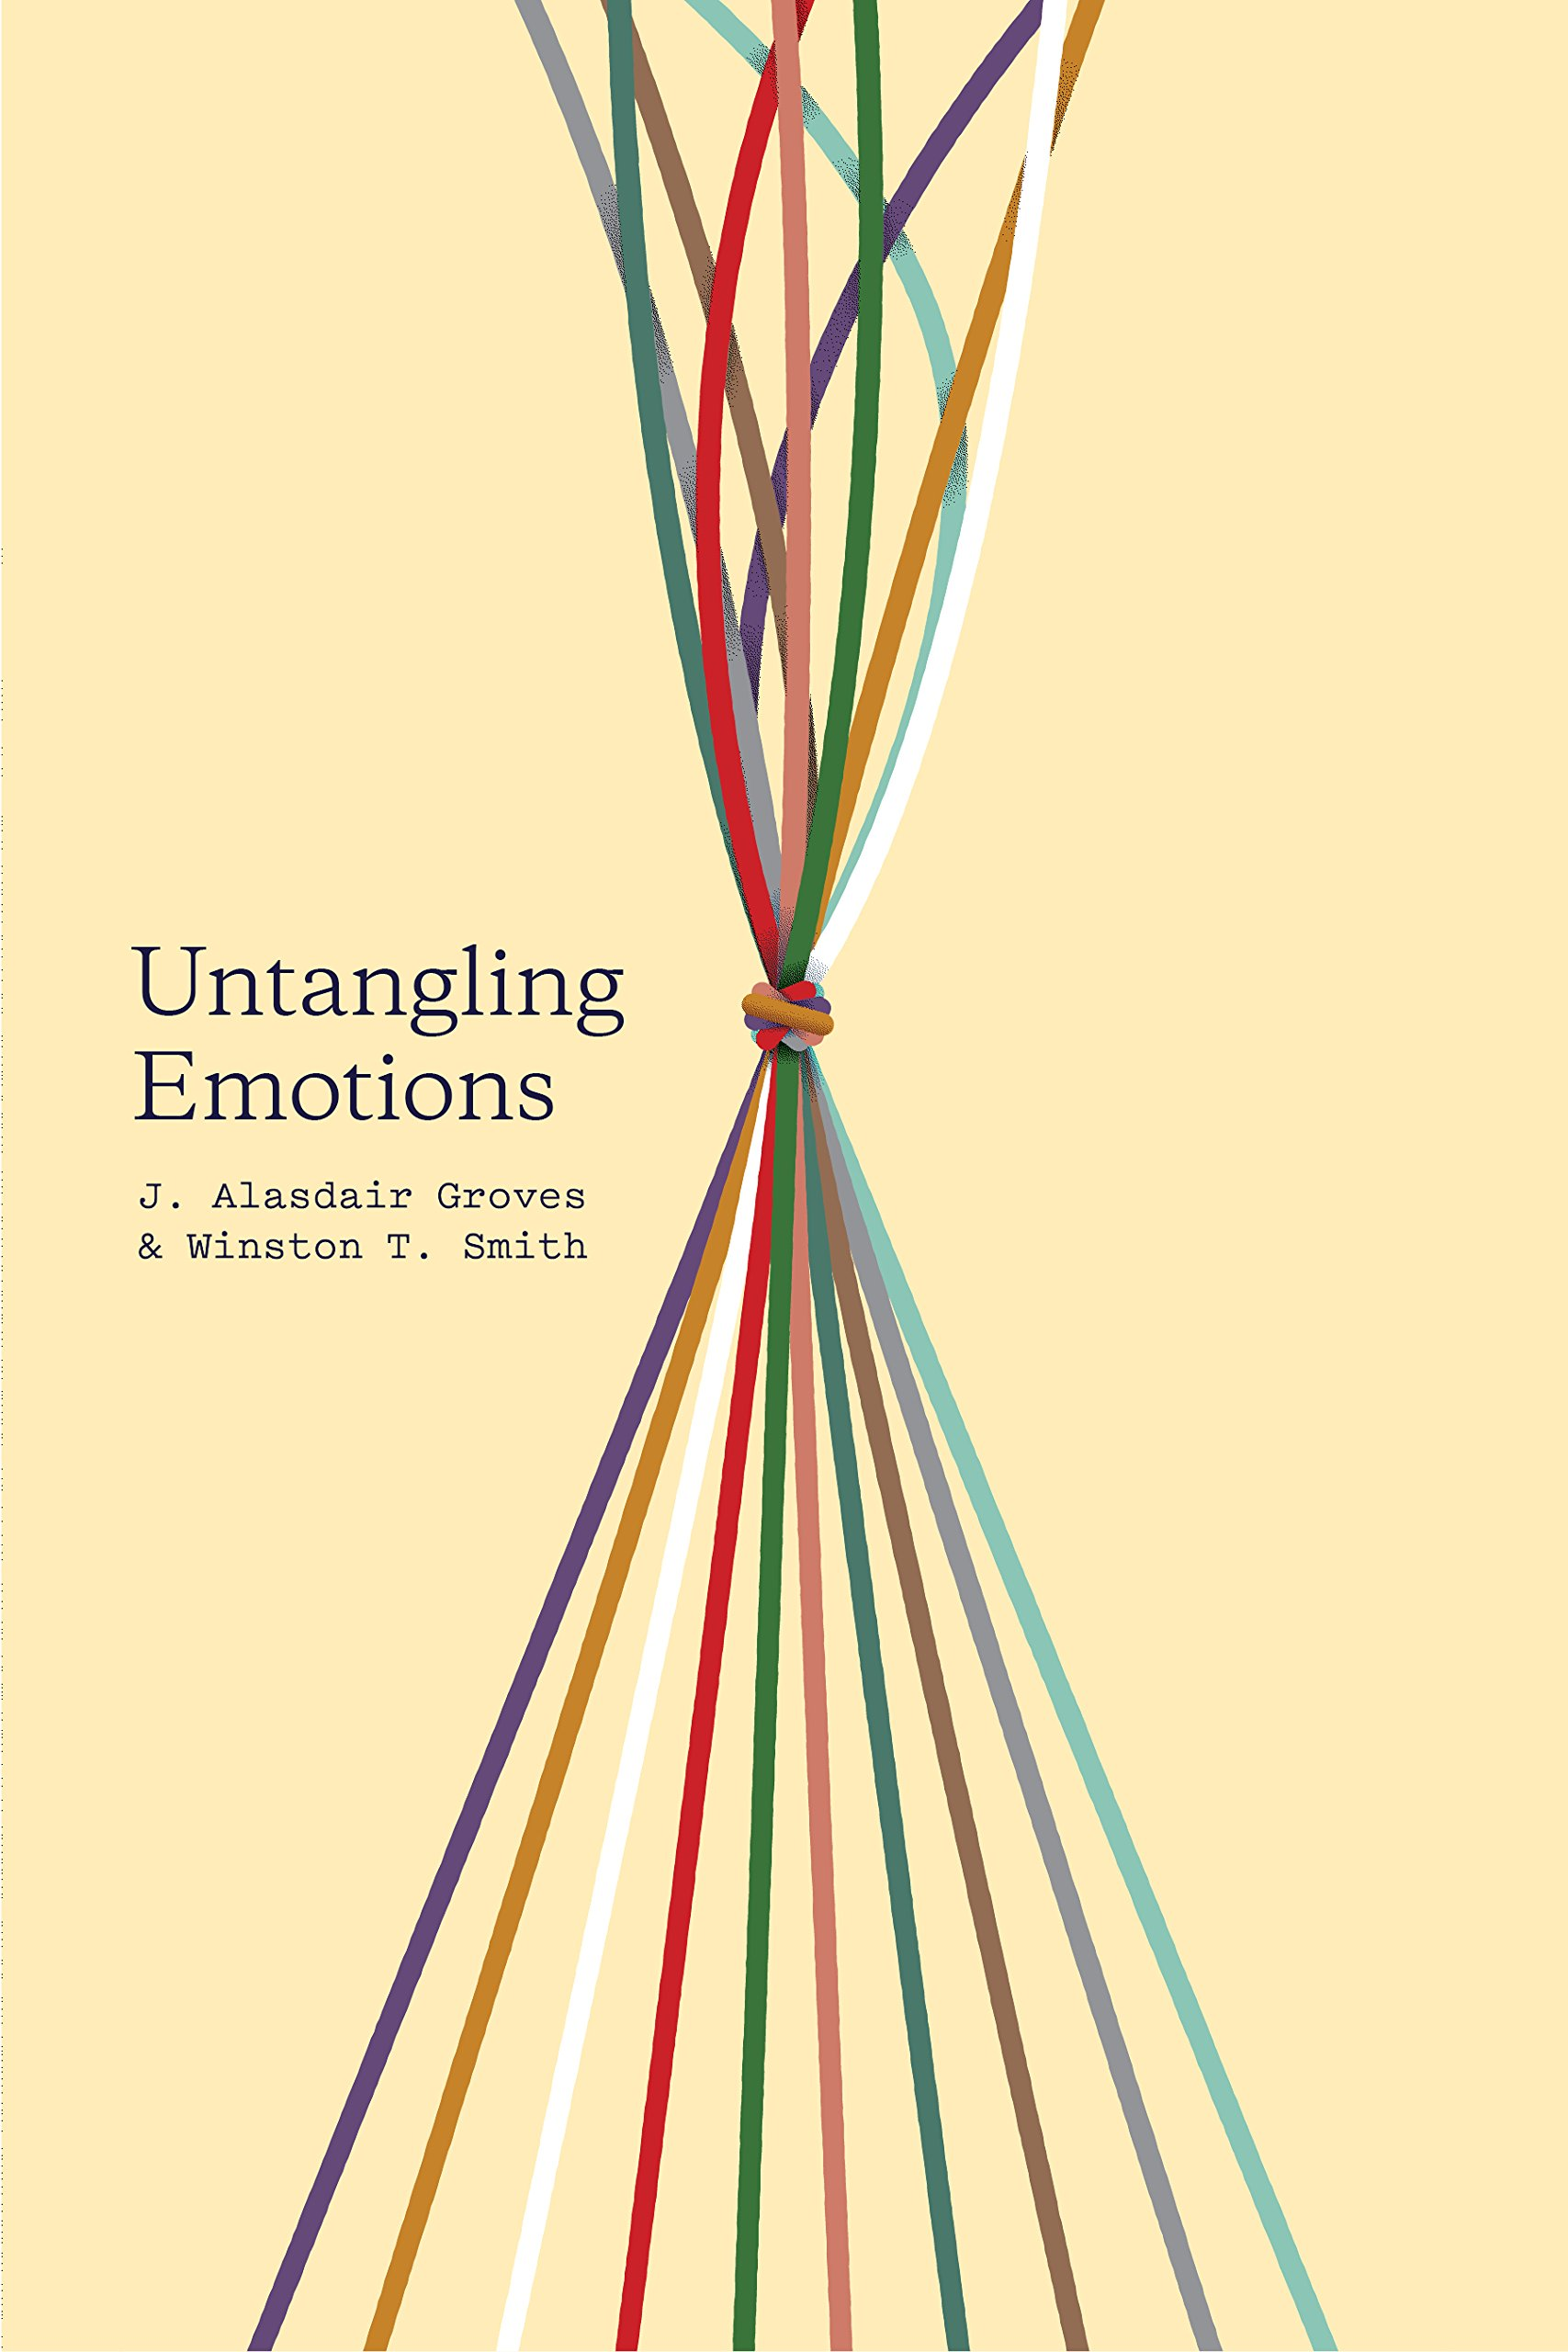 "Untangling Emotions: ""God's Gift of Emotions"": Groves, J. Alasdair, Smith,  Winston T.: 9781433557828: Amazon.com: Books"